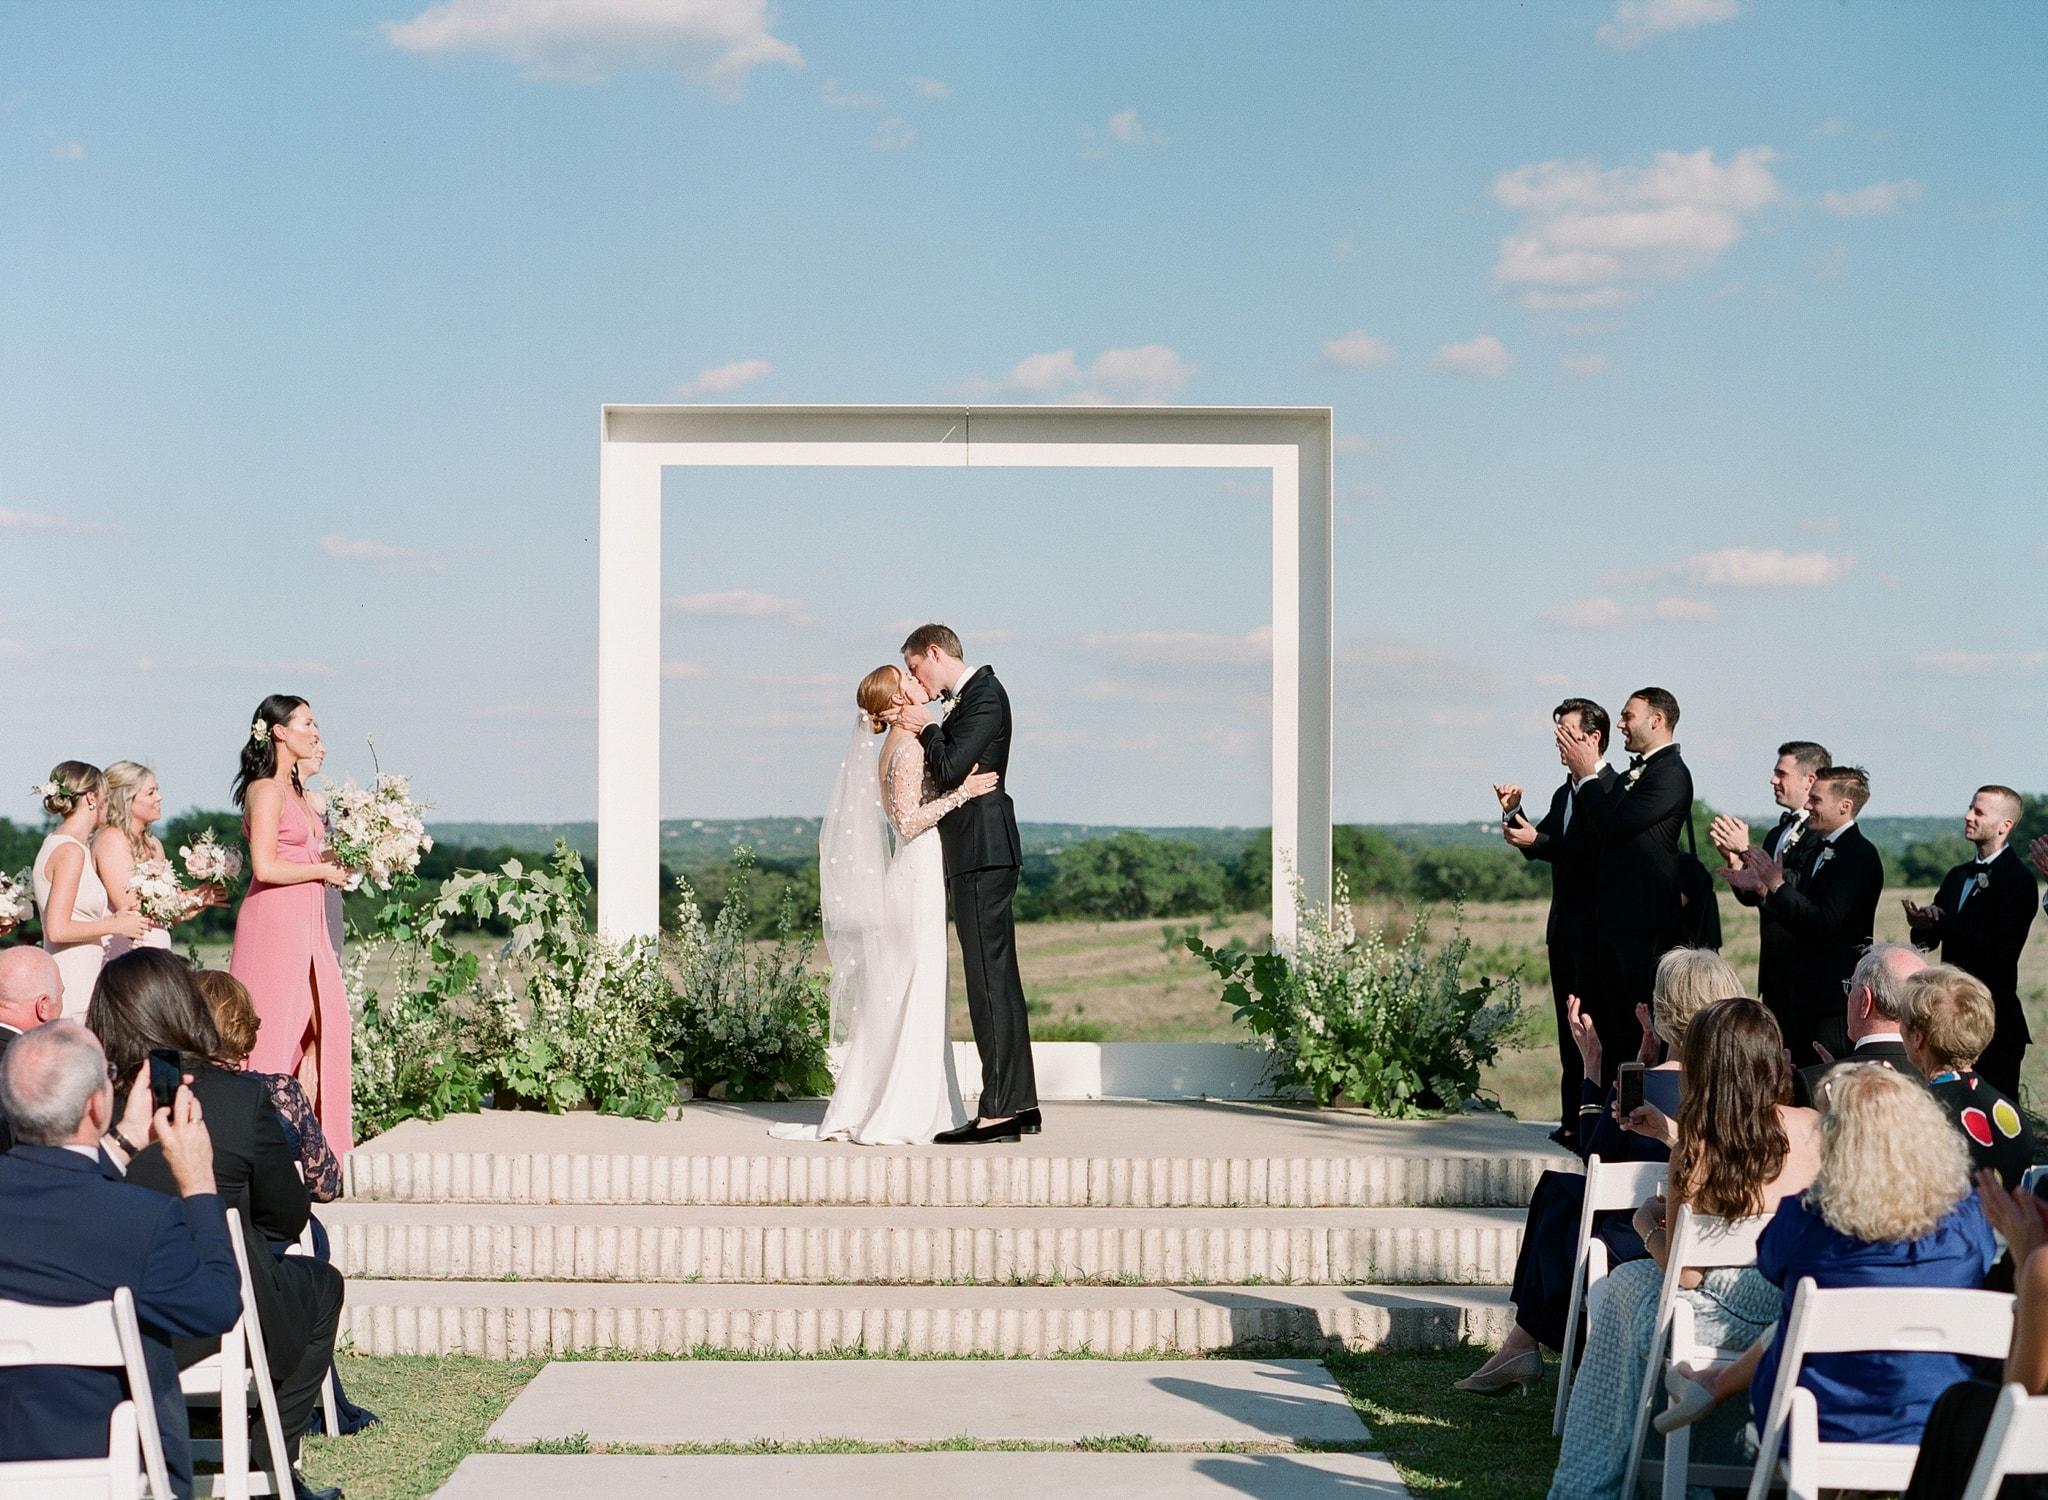 prospect-house-wedding-25.jpg